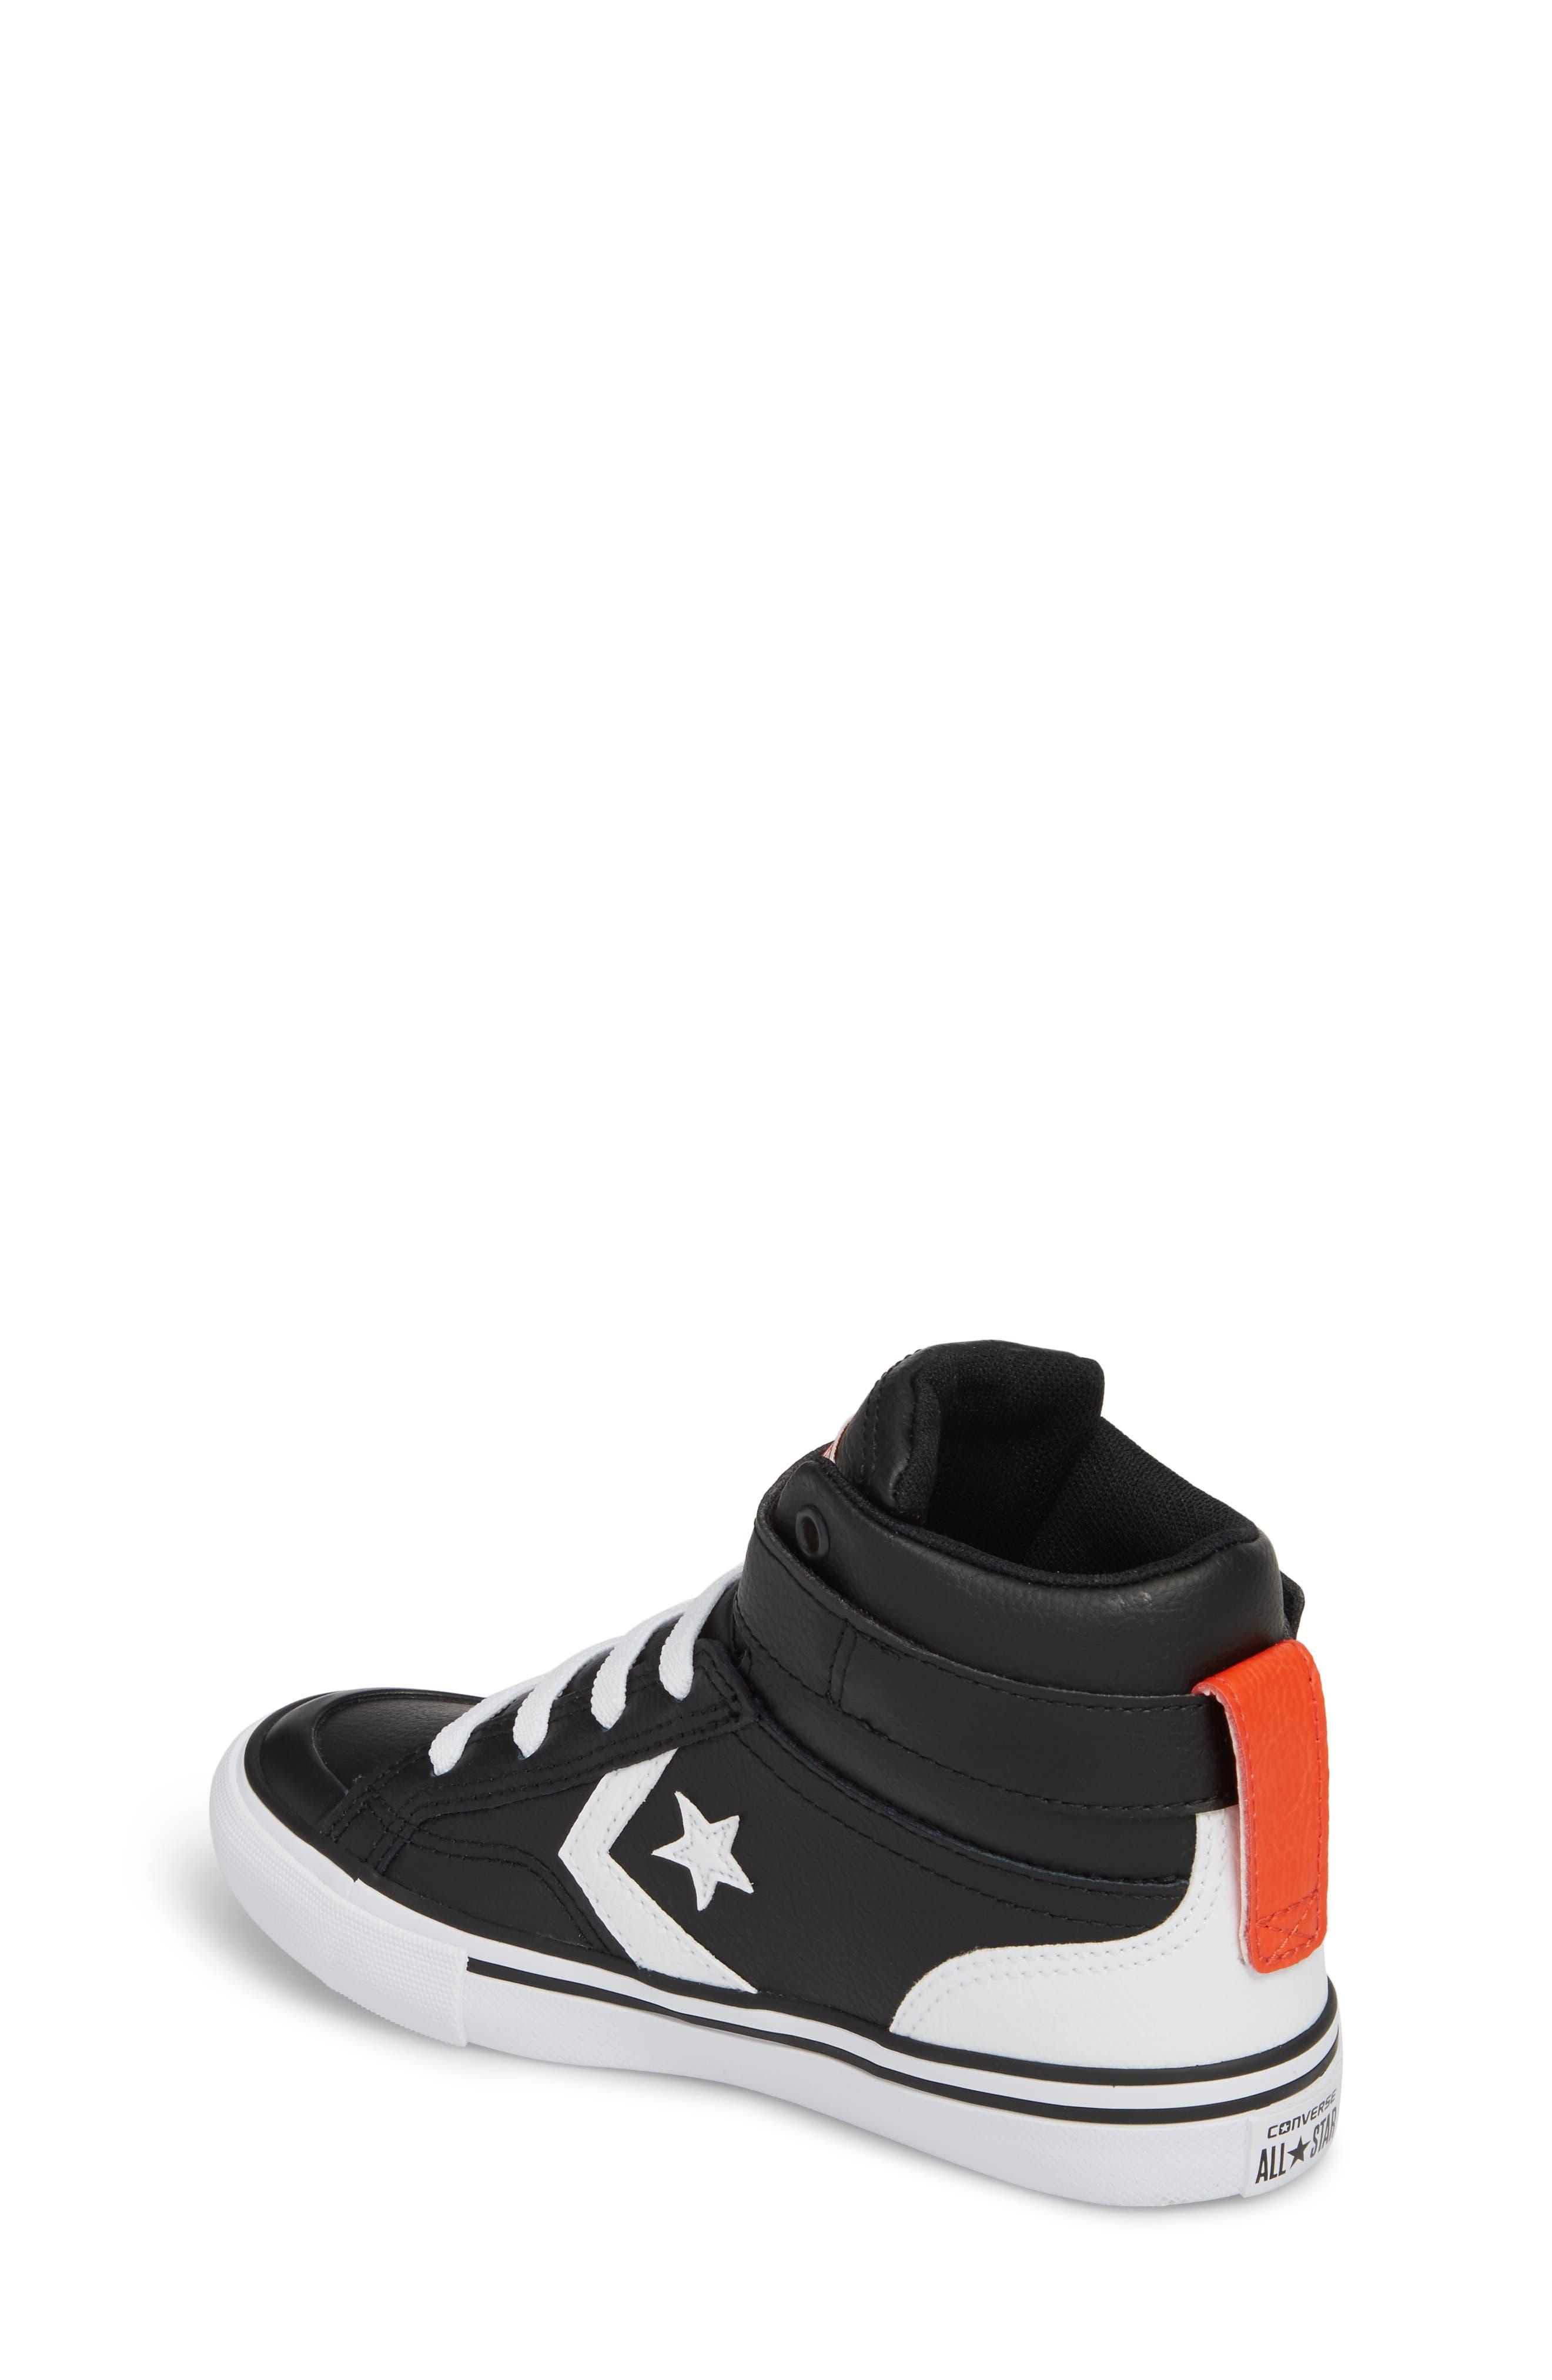 Pro Blaze High Top Sneaker,                             Alternate thumbnail 2, color,                             001